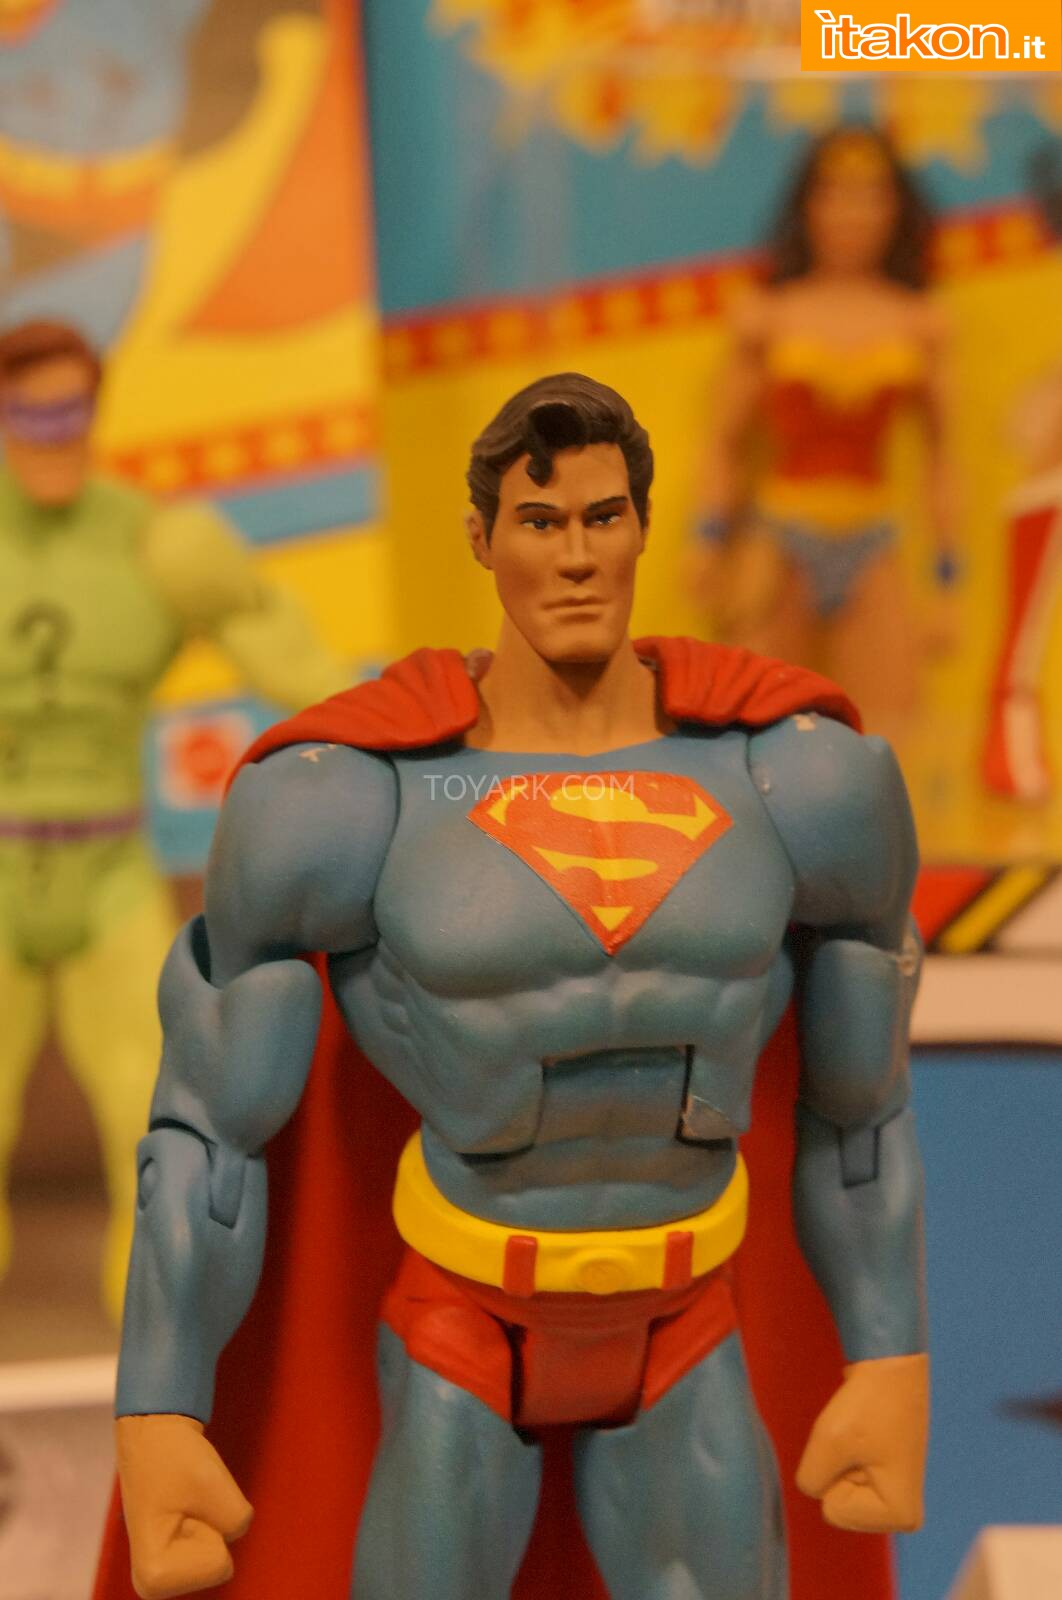 Link a Toy-Fair-2014-Mattel-DC-Comics-048